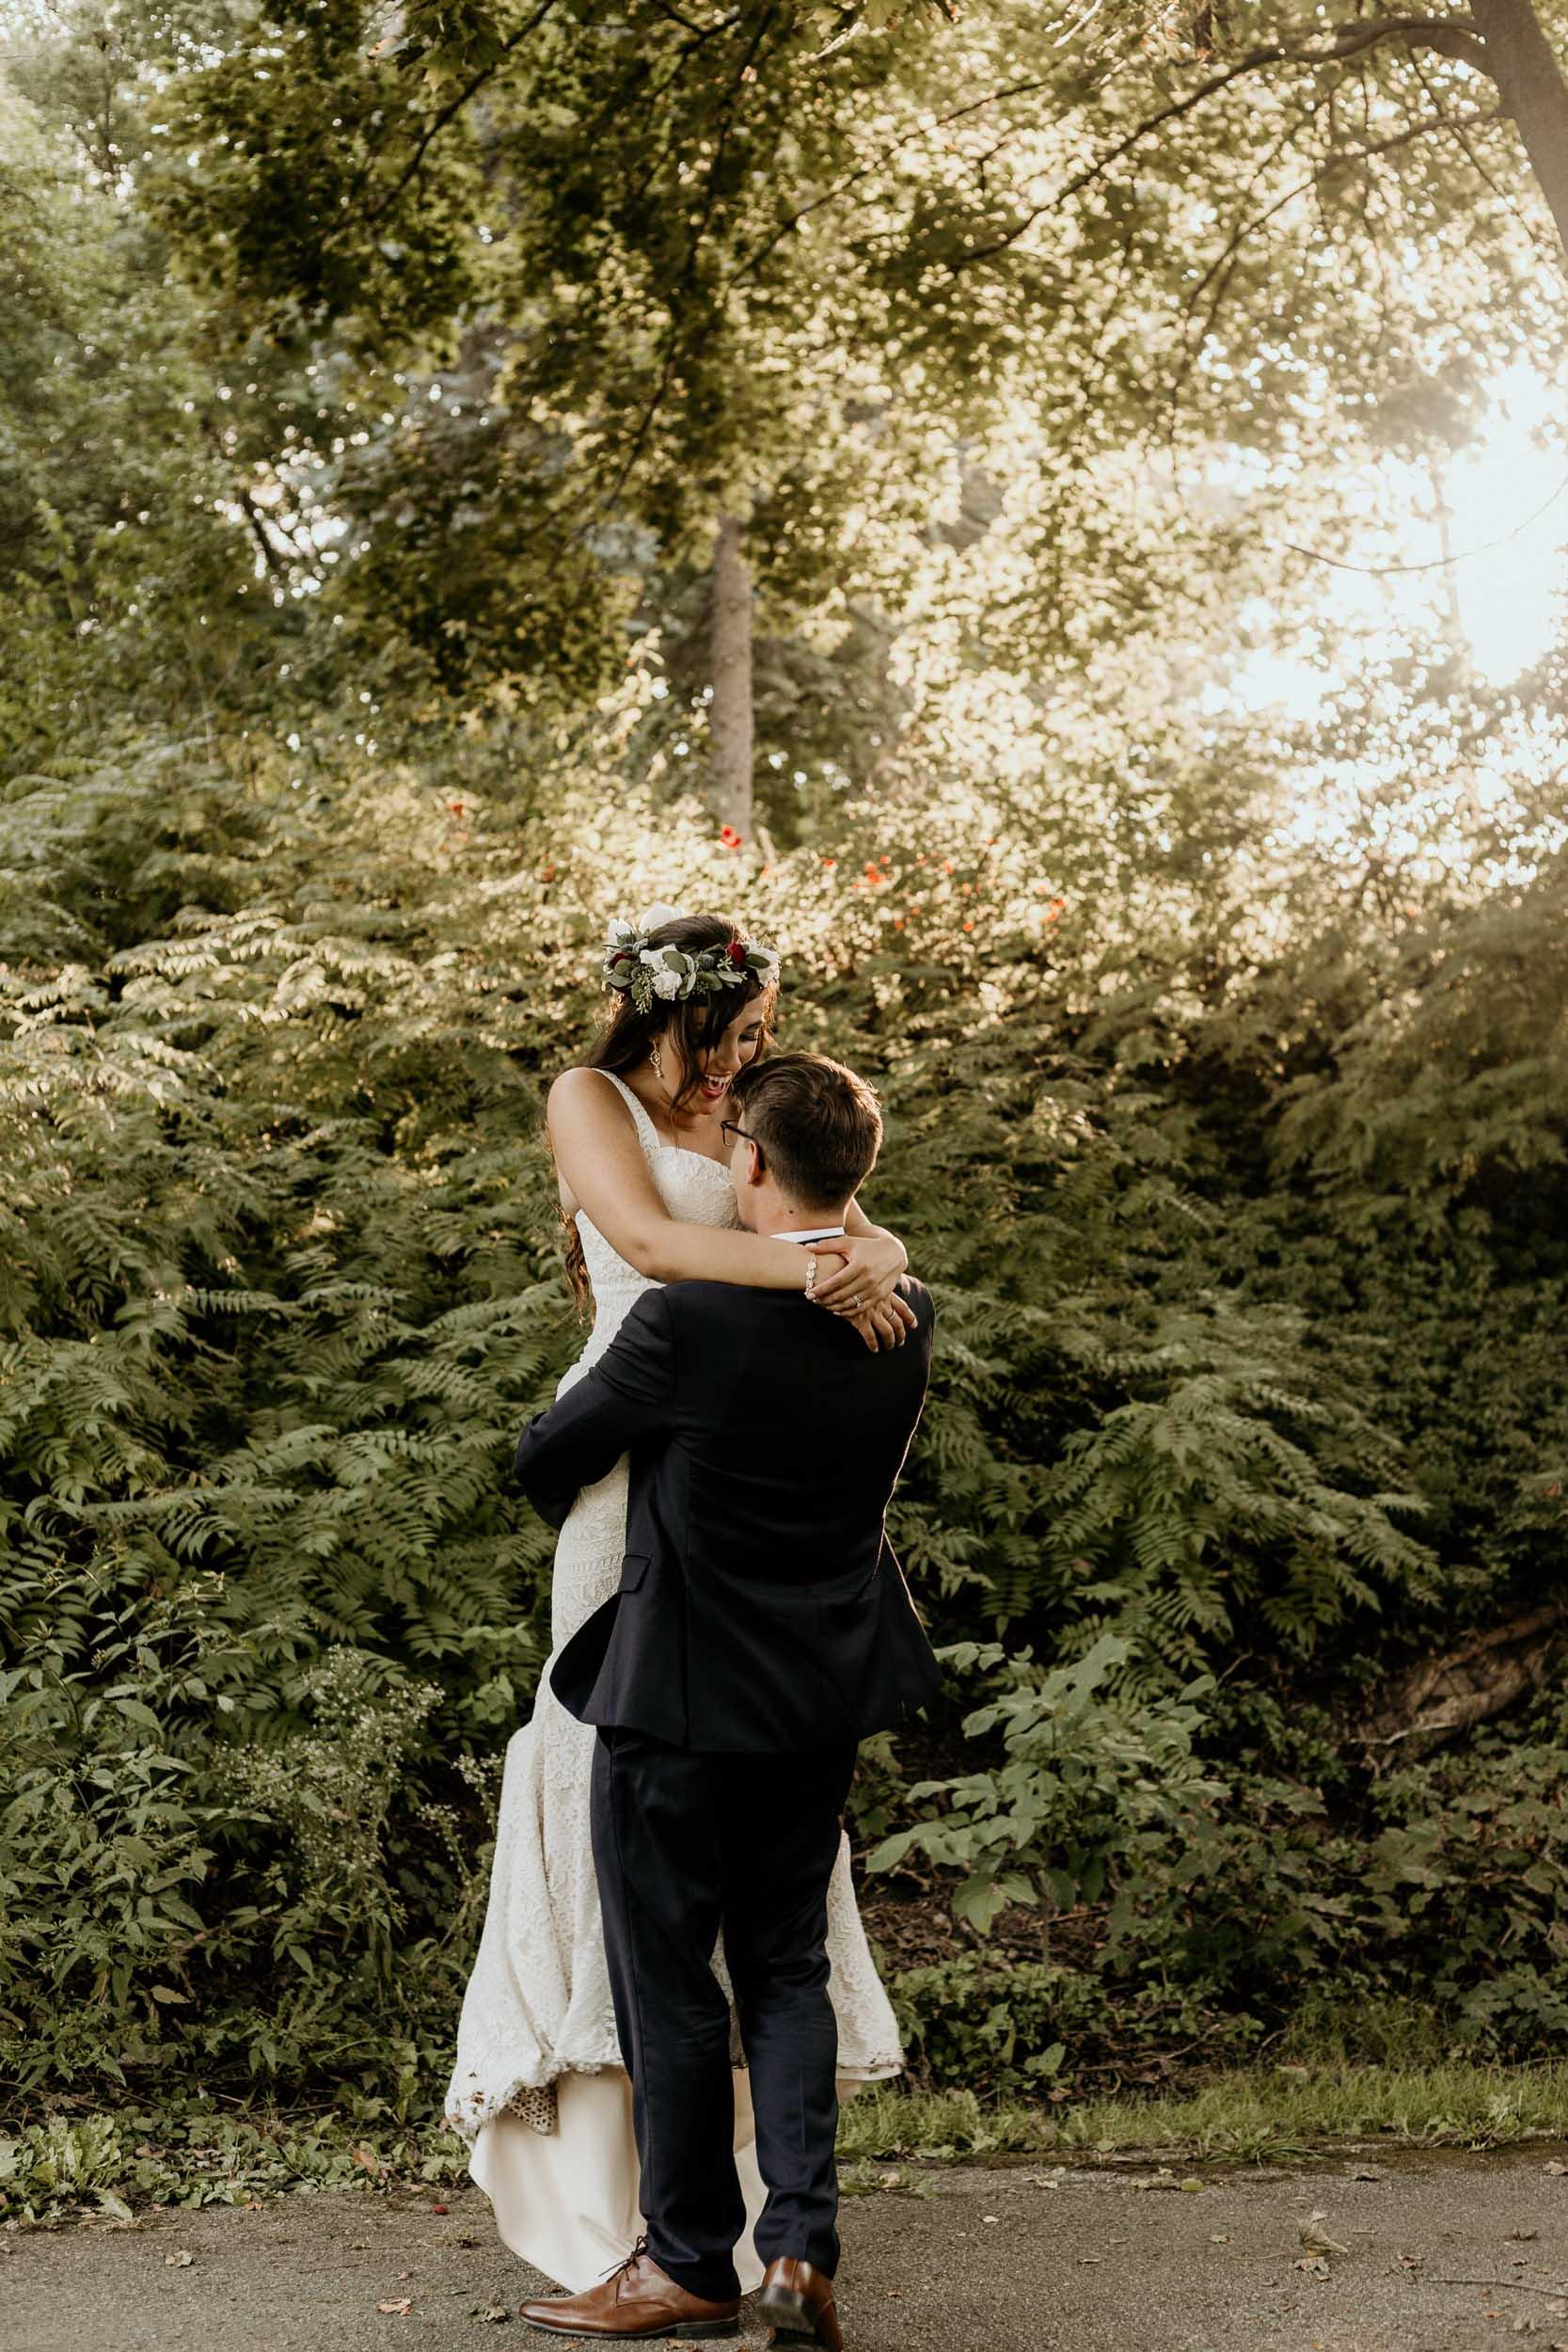 intimate-wedding-elopement-photographer-ottawa-toronto-8049.jpg